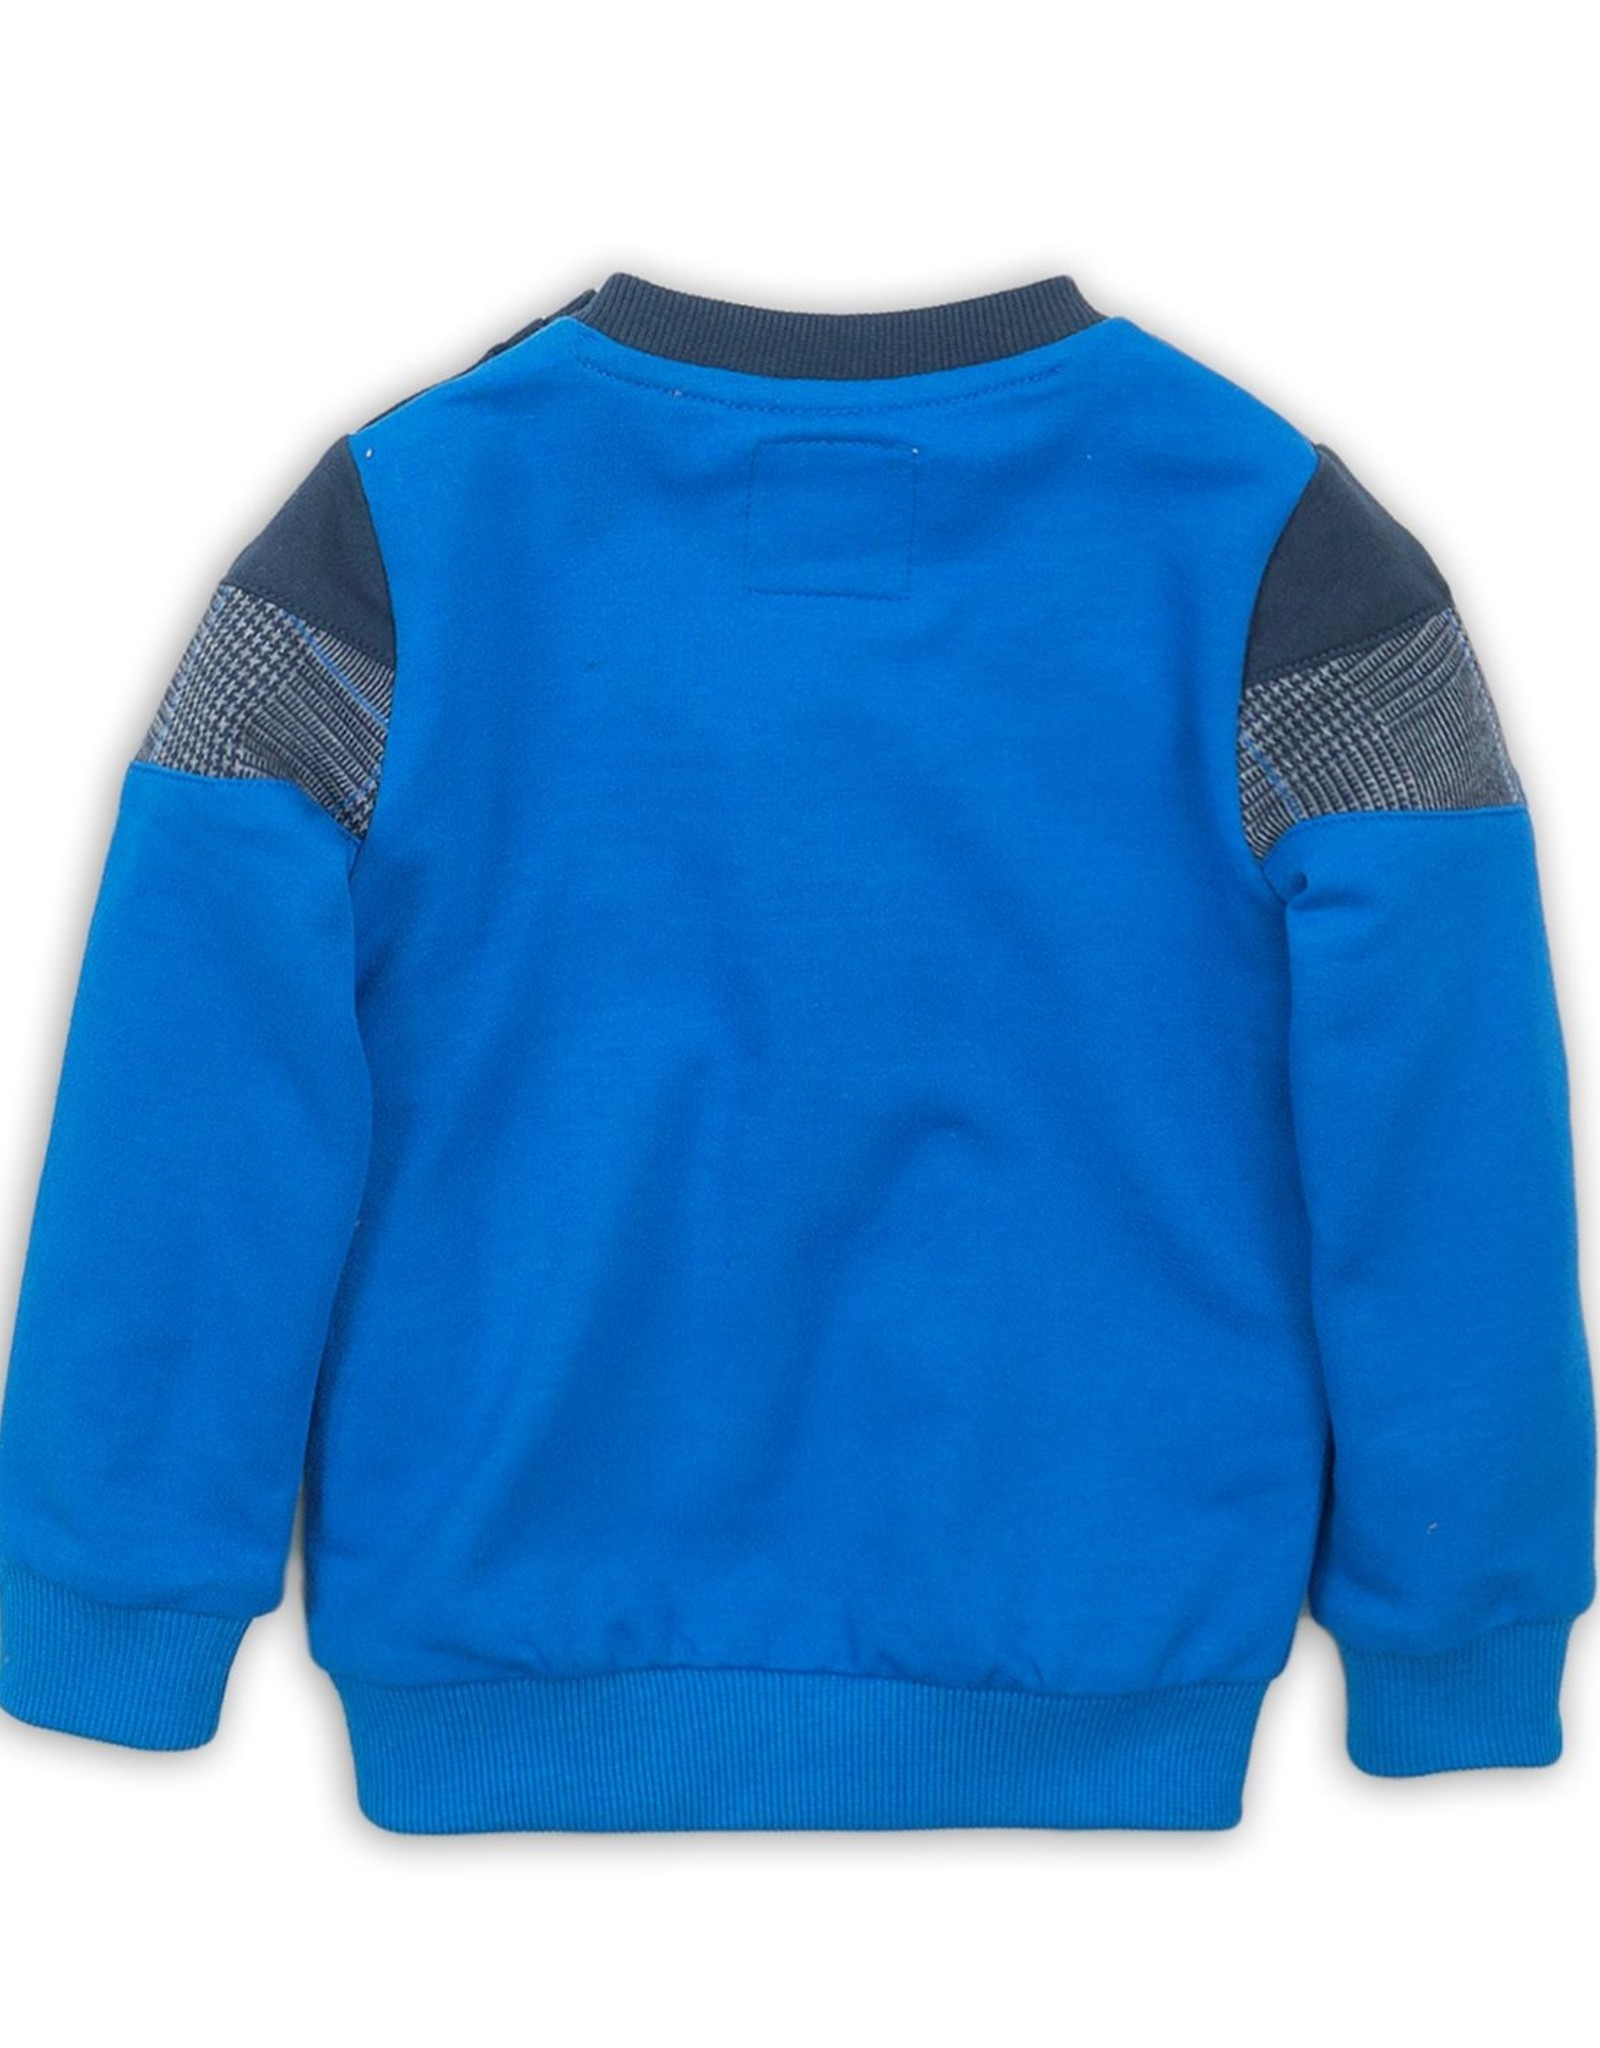 Koko Noko Koko Noko sweater 36922 navy